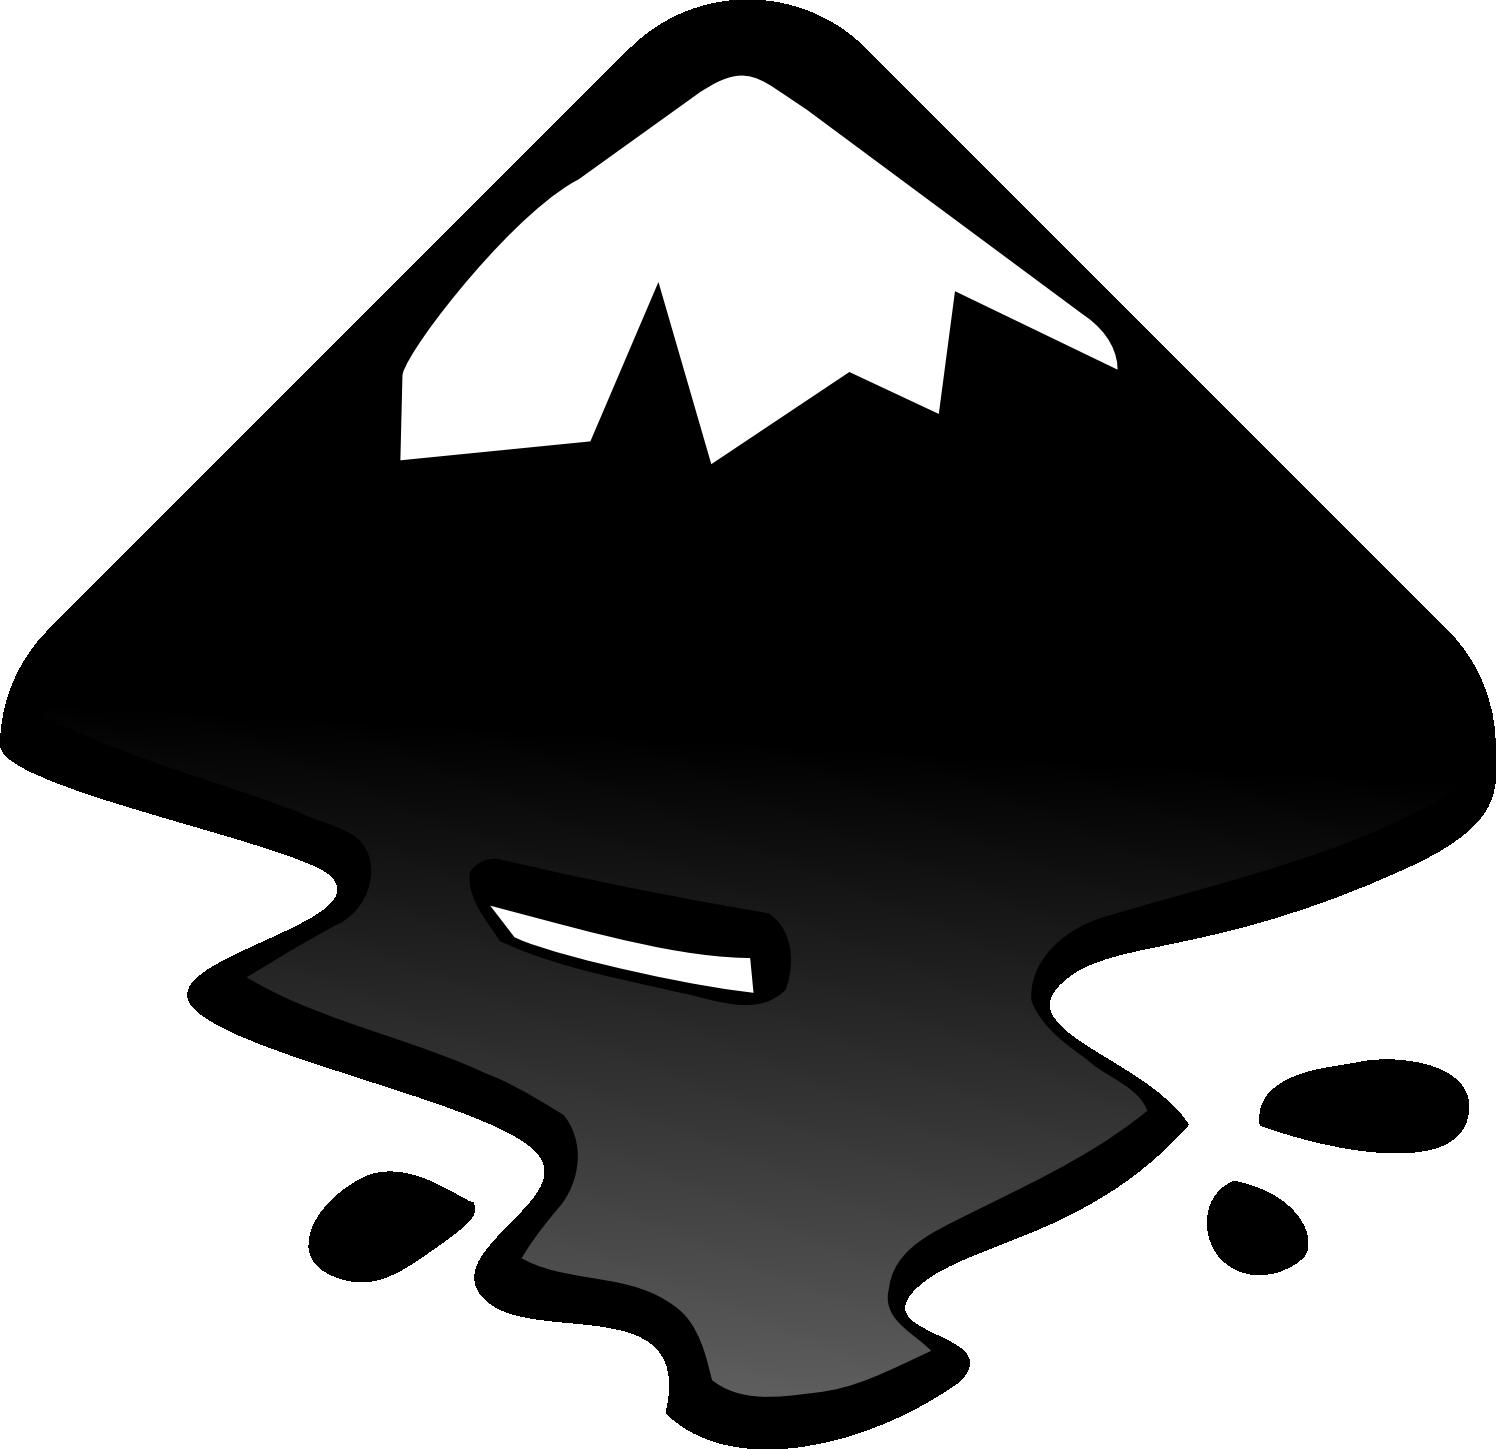 Ink scape logo